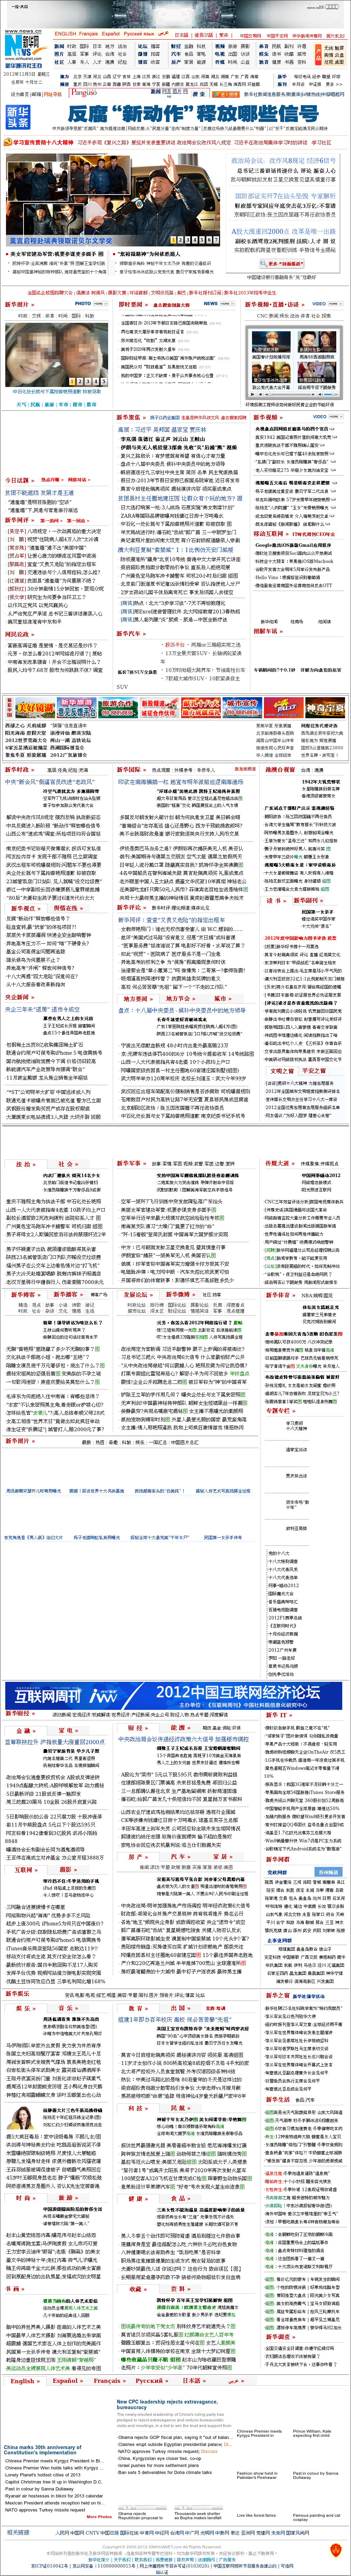 Xinhua at Wednesday Dec. 5, 2012, 2:46 a.m. UTC